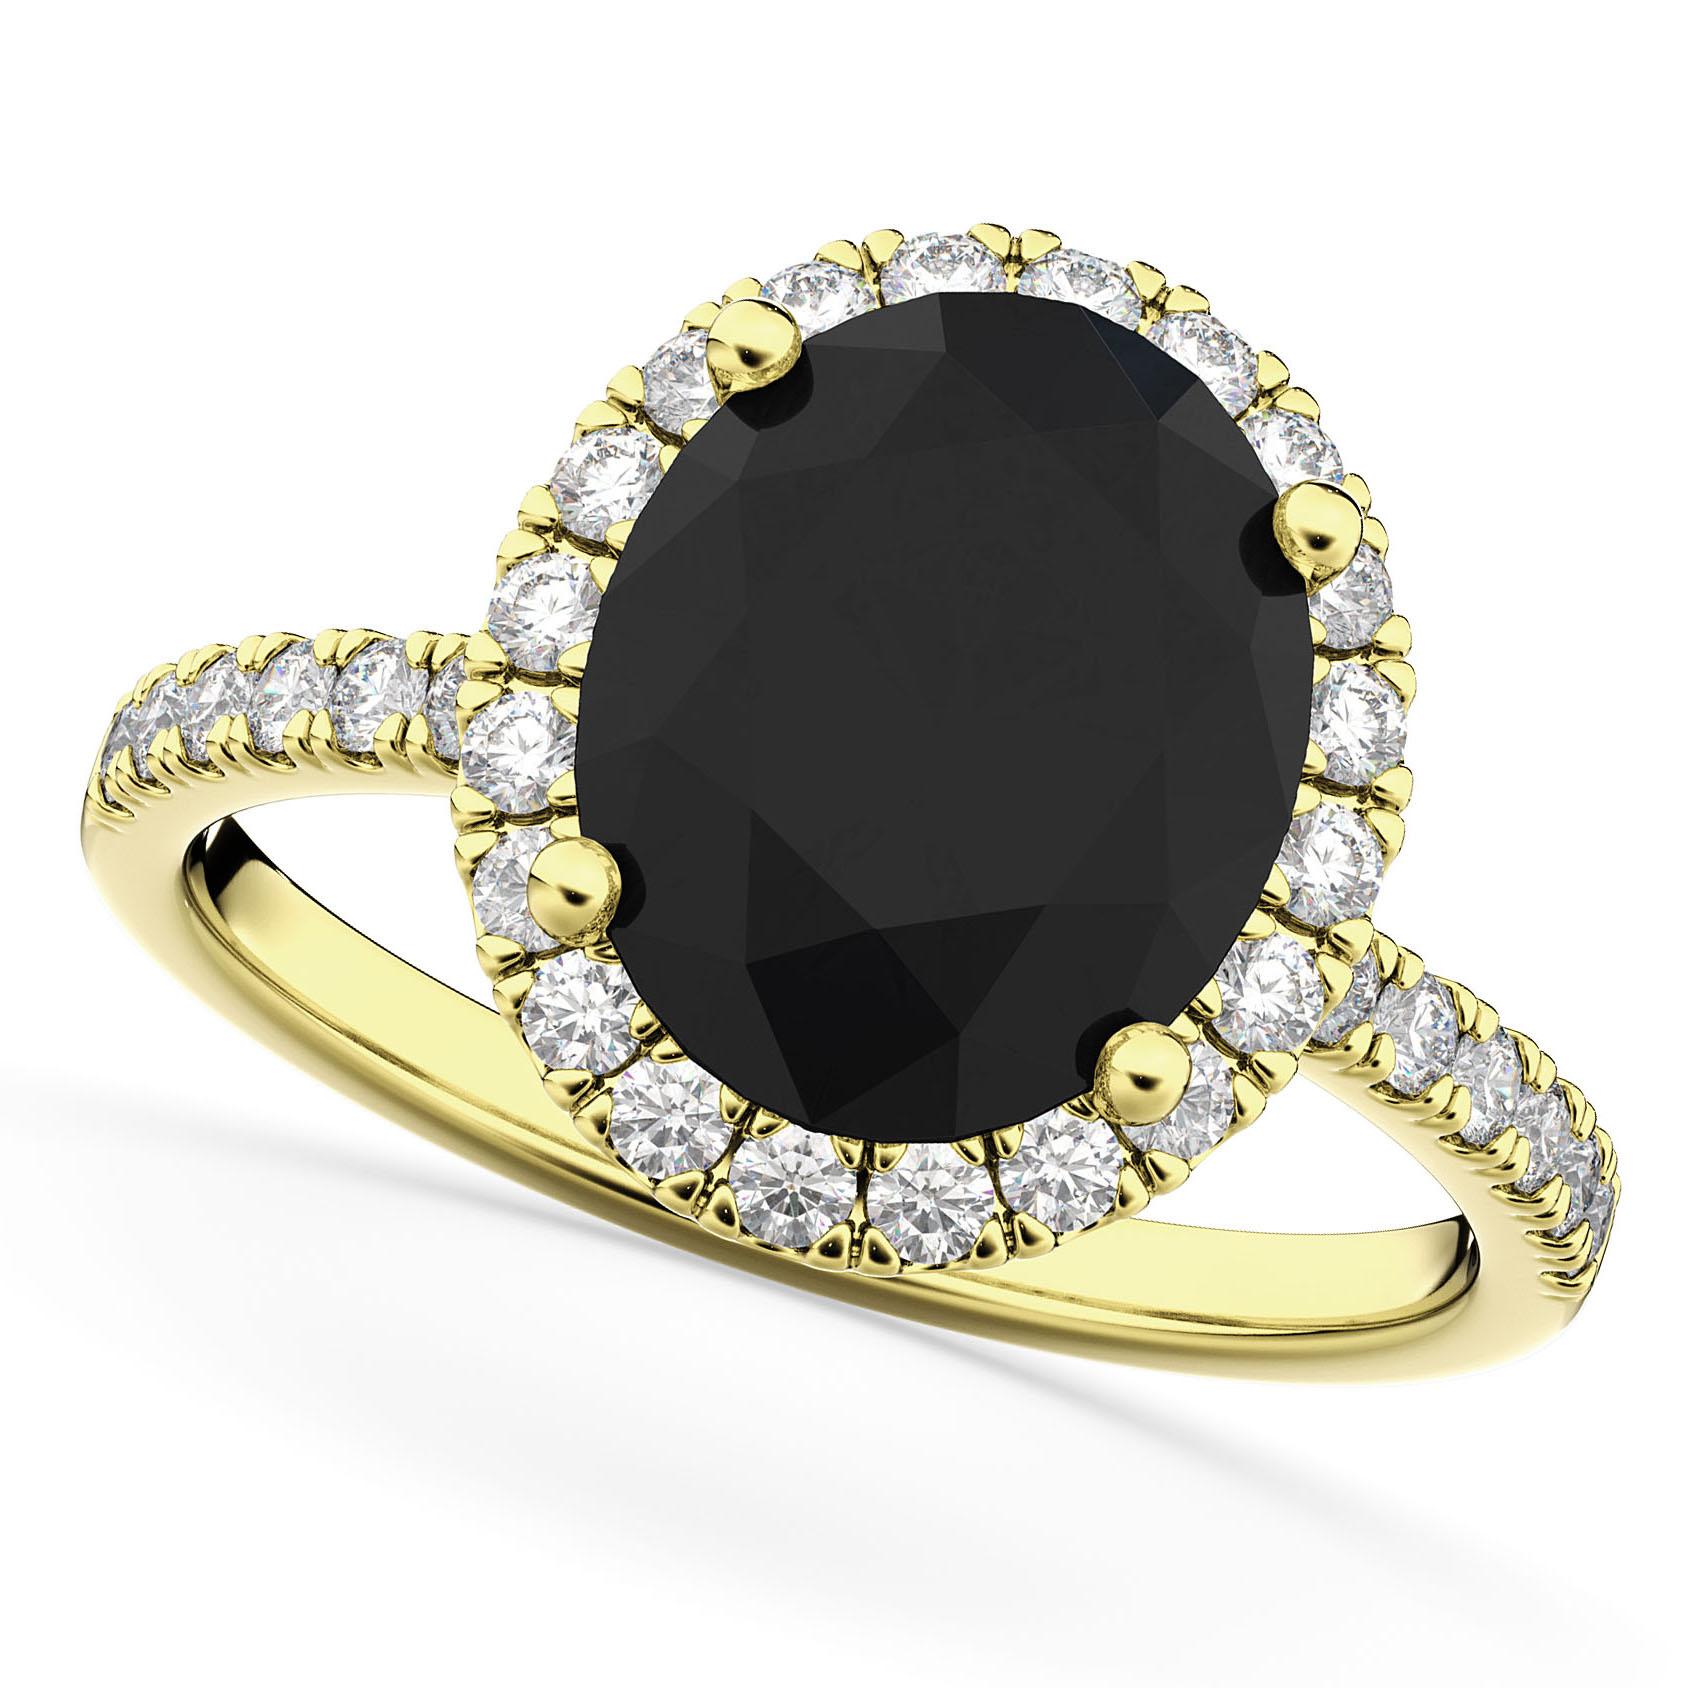 Oval Black Diamond & Diamond Engagement Ring 14K Yellow Gold 3.51ct